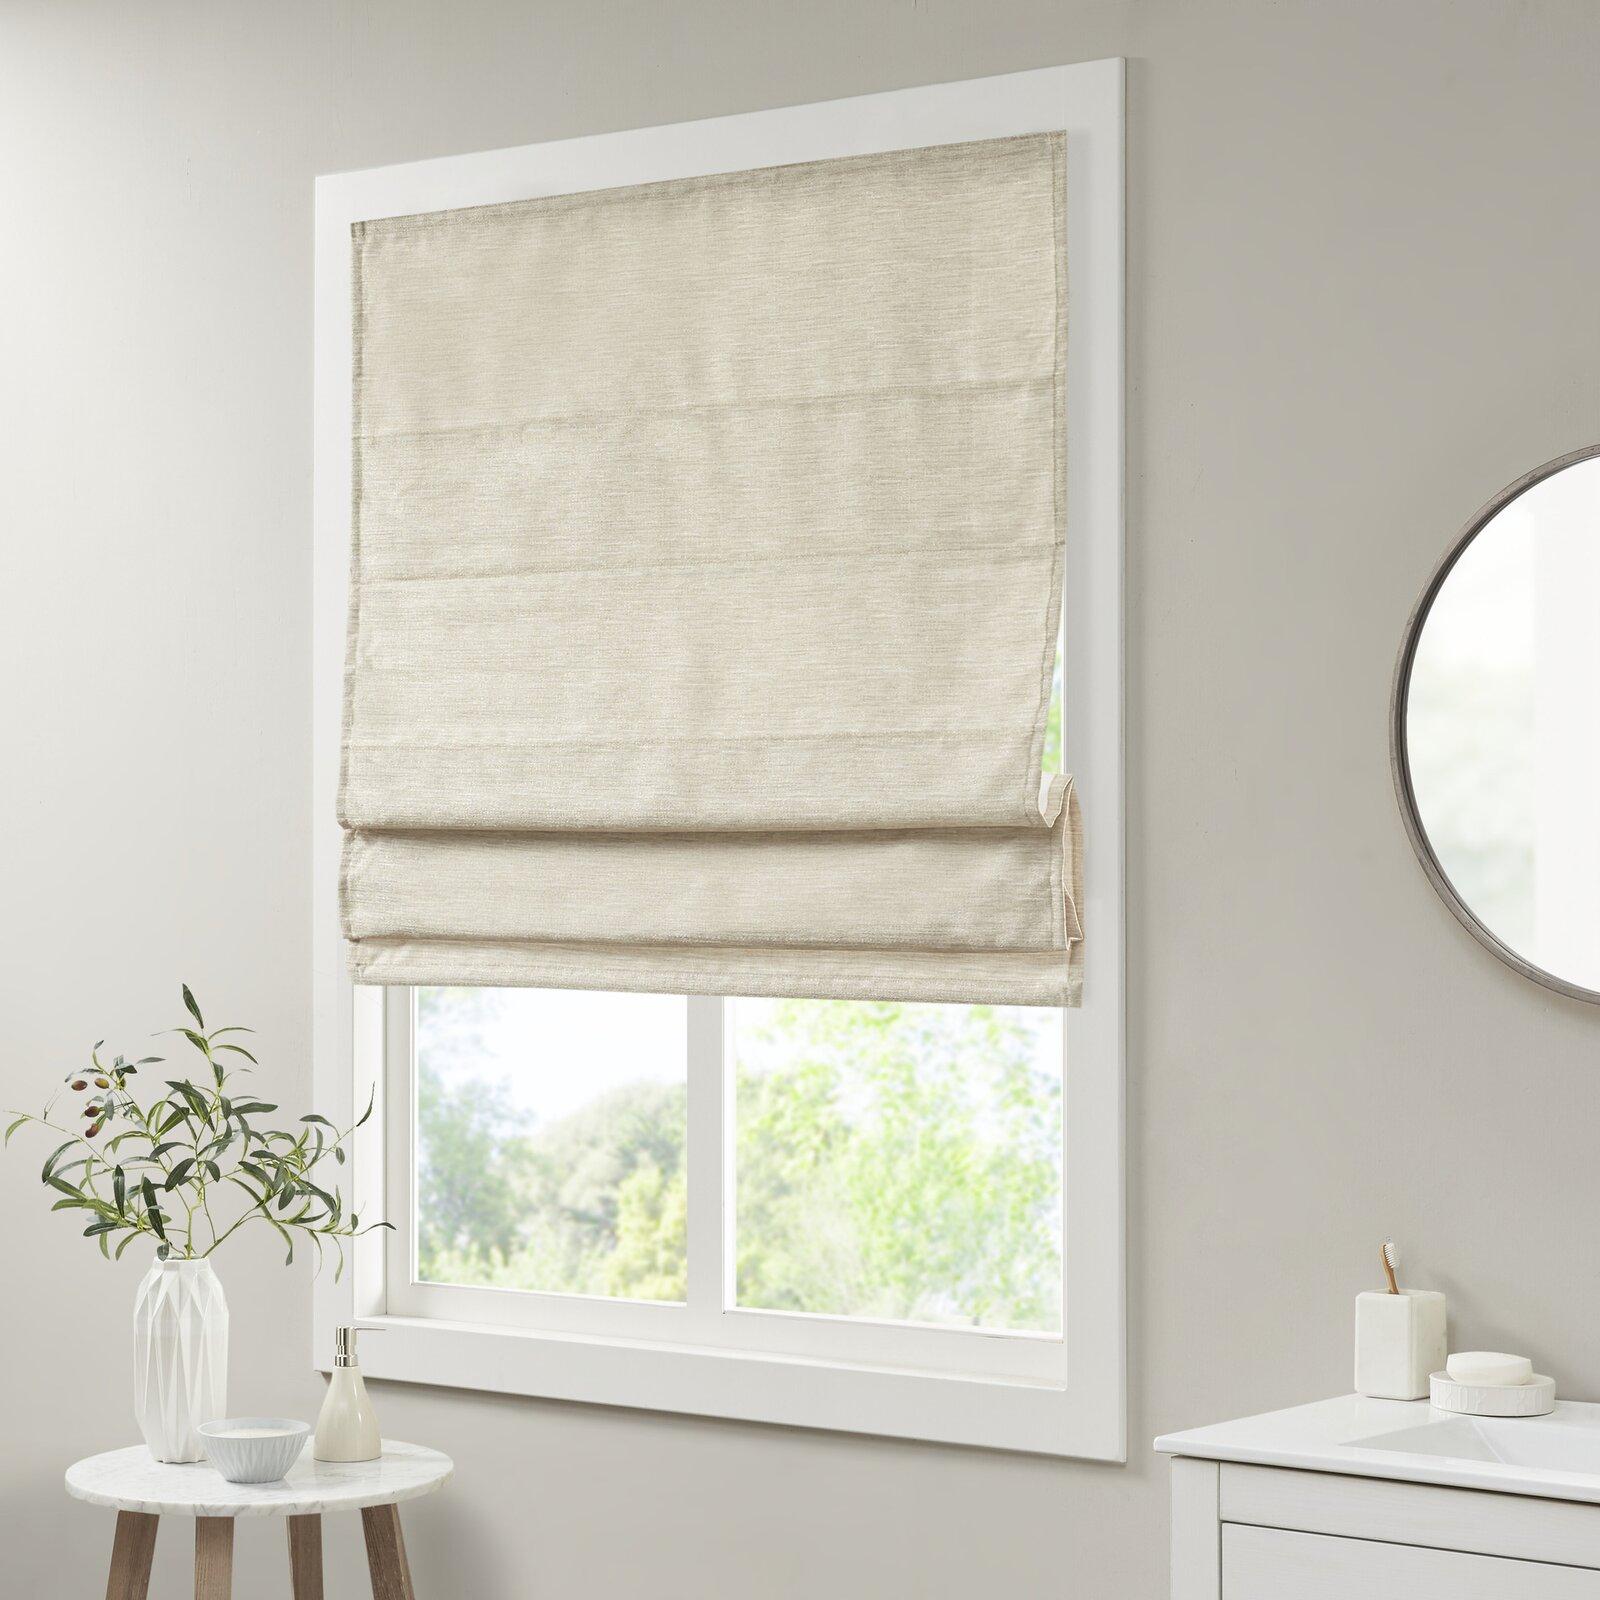 silk shades window treatment